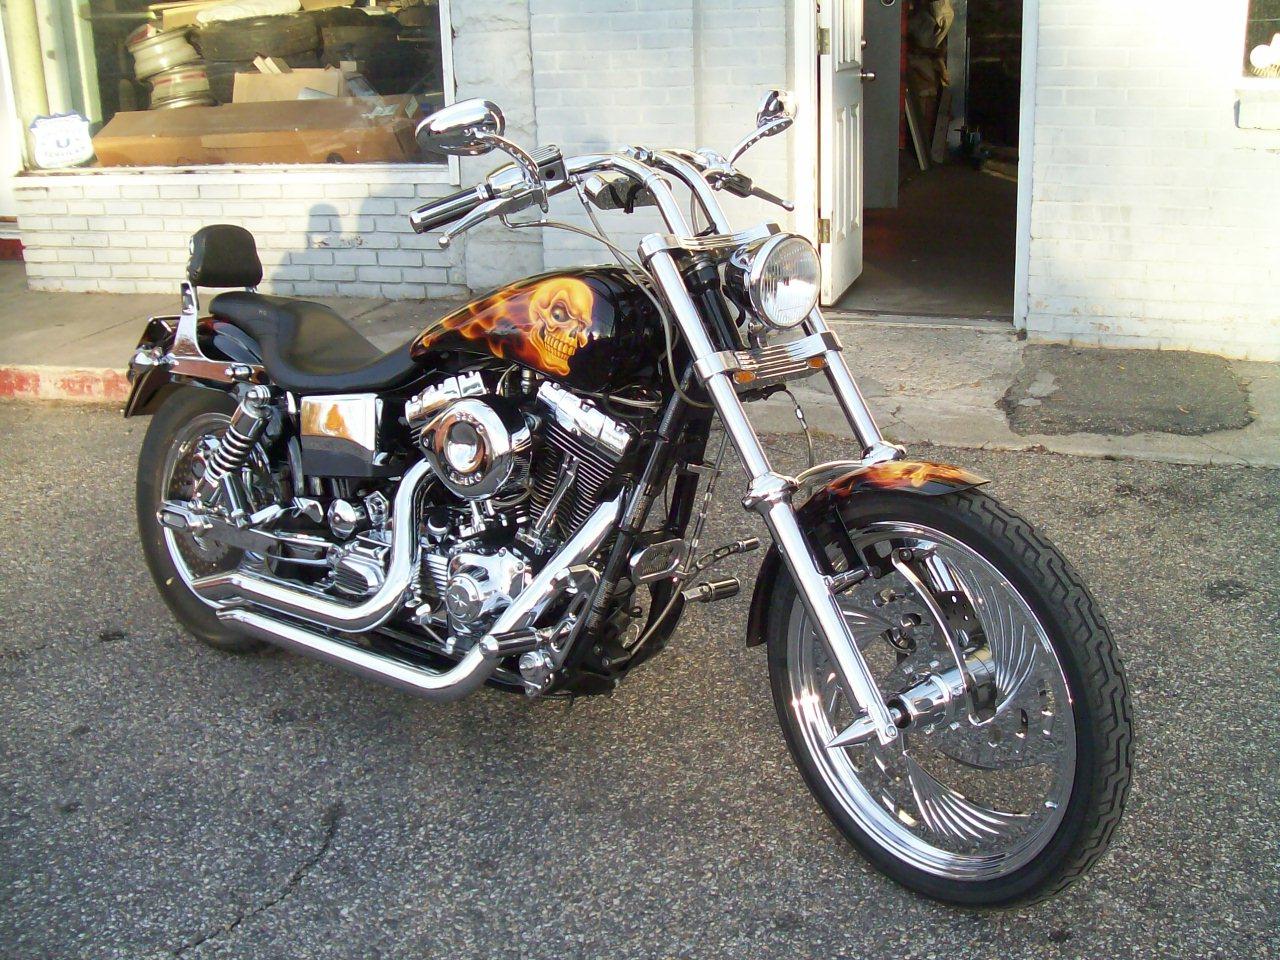 34 motor co llc for Harley davidson motor co